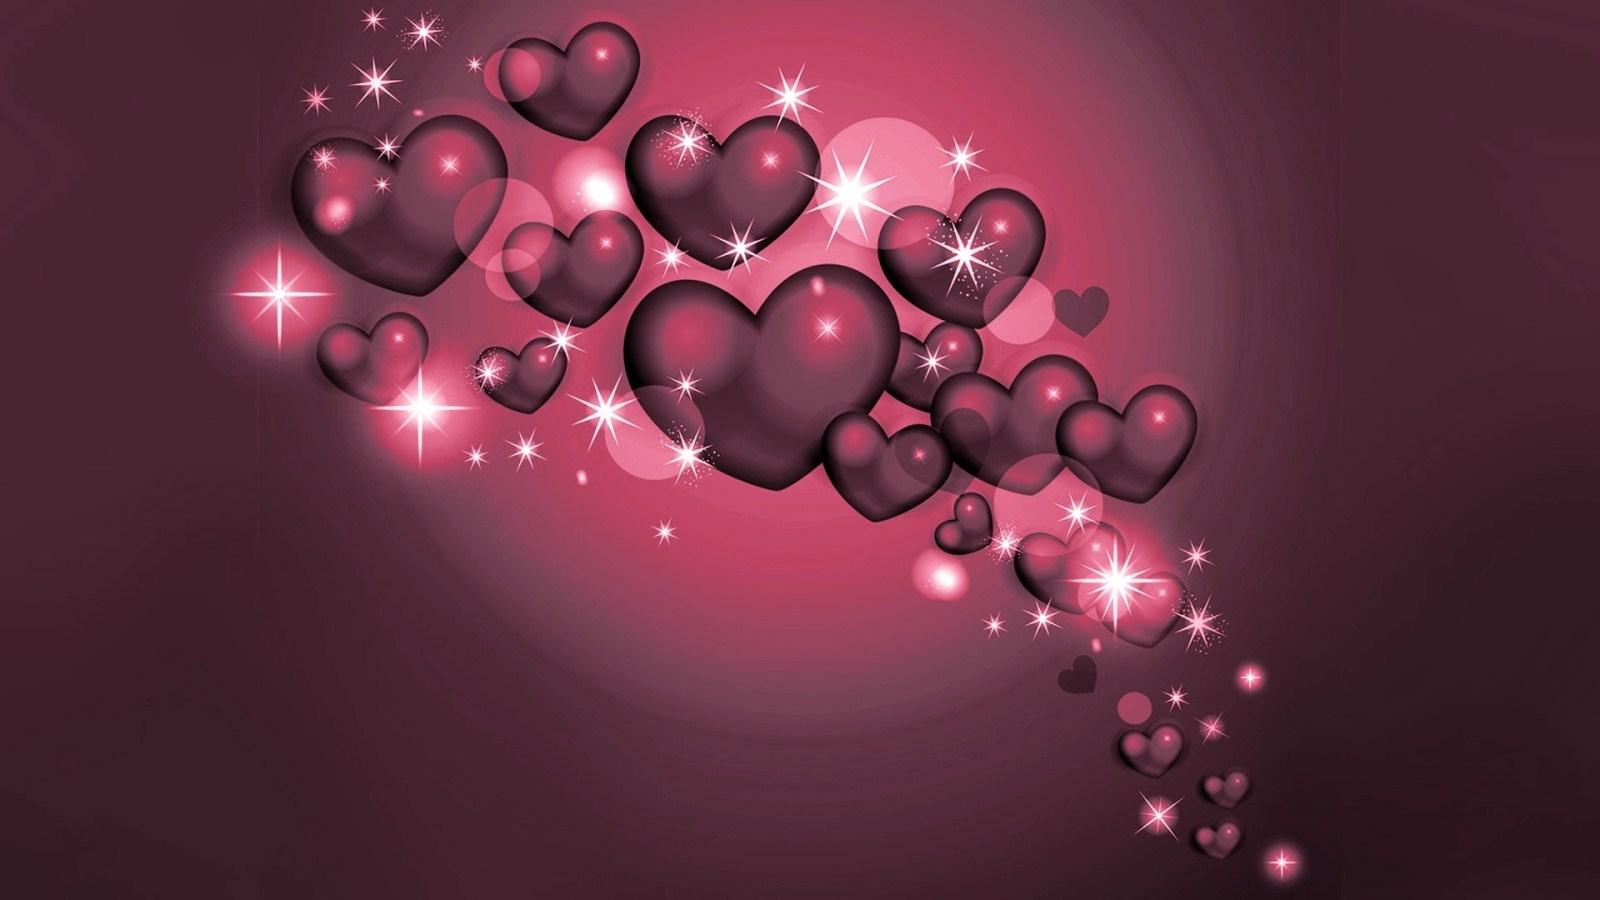 50 Hd Love Wallpapers Free Download On Wallpapersafari